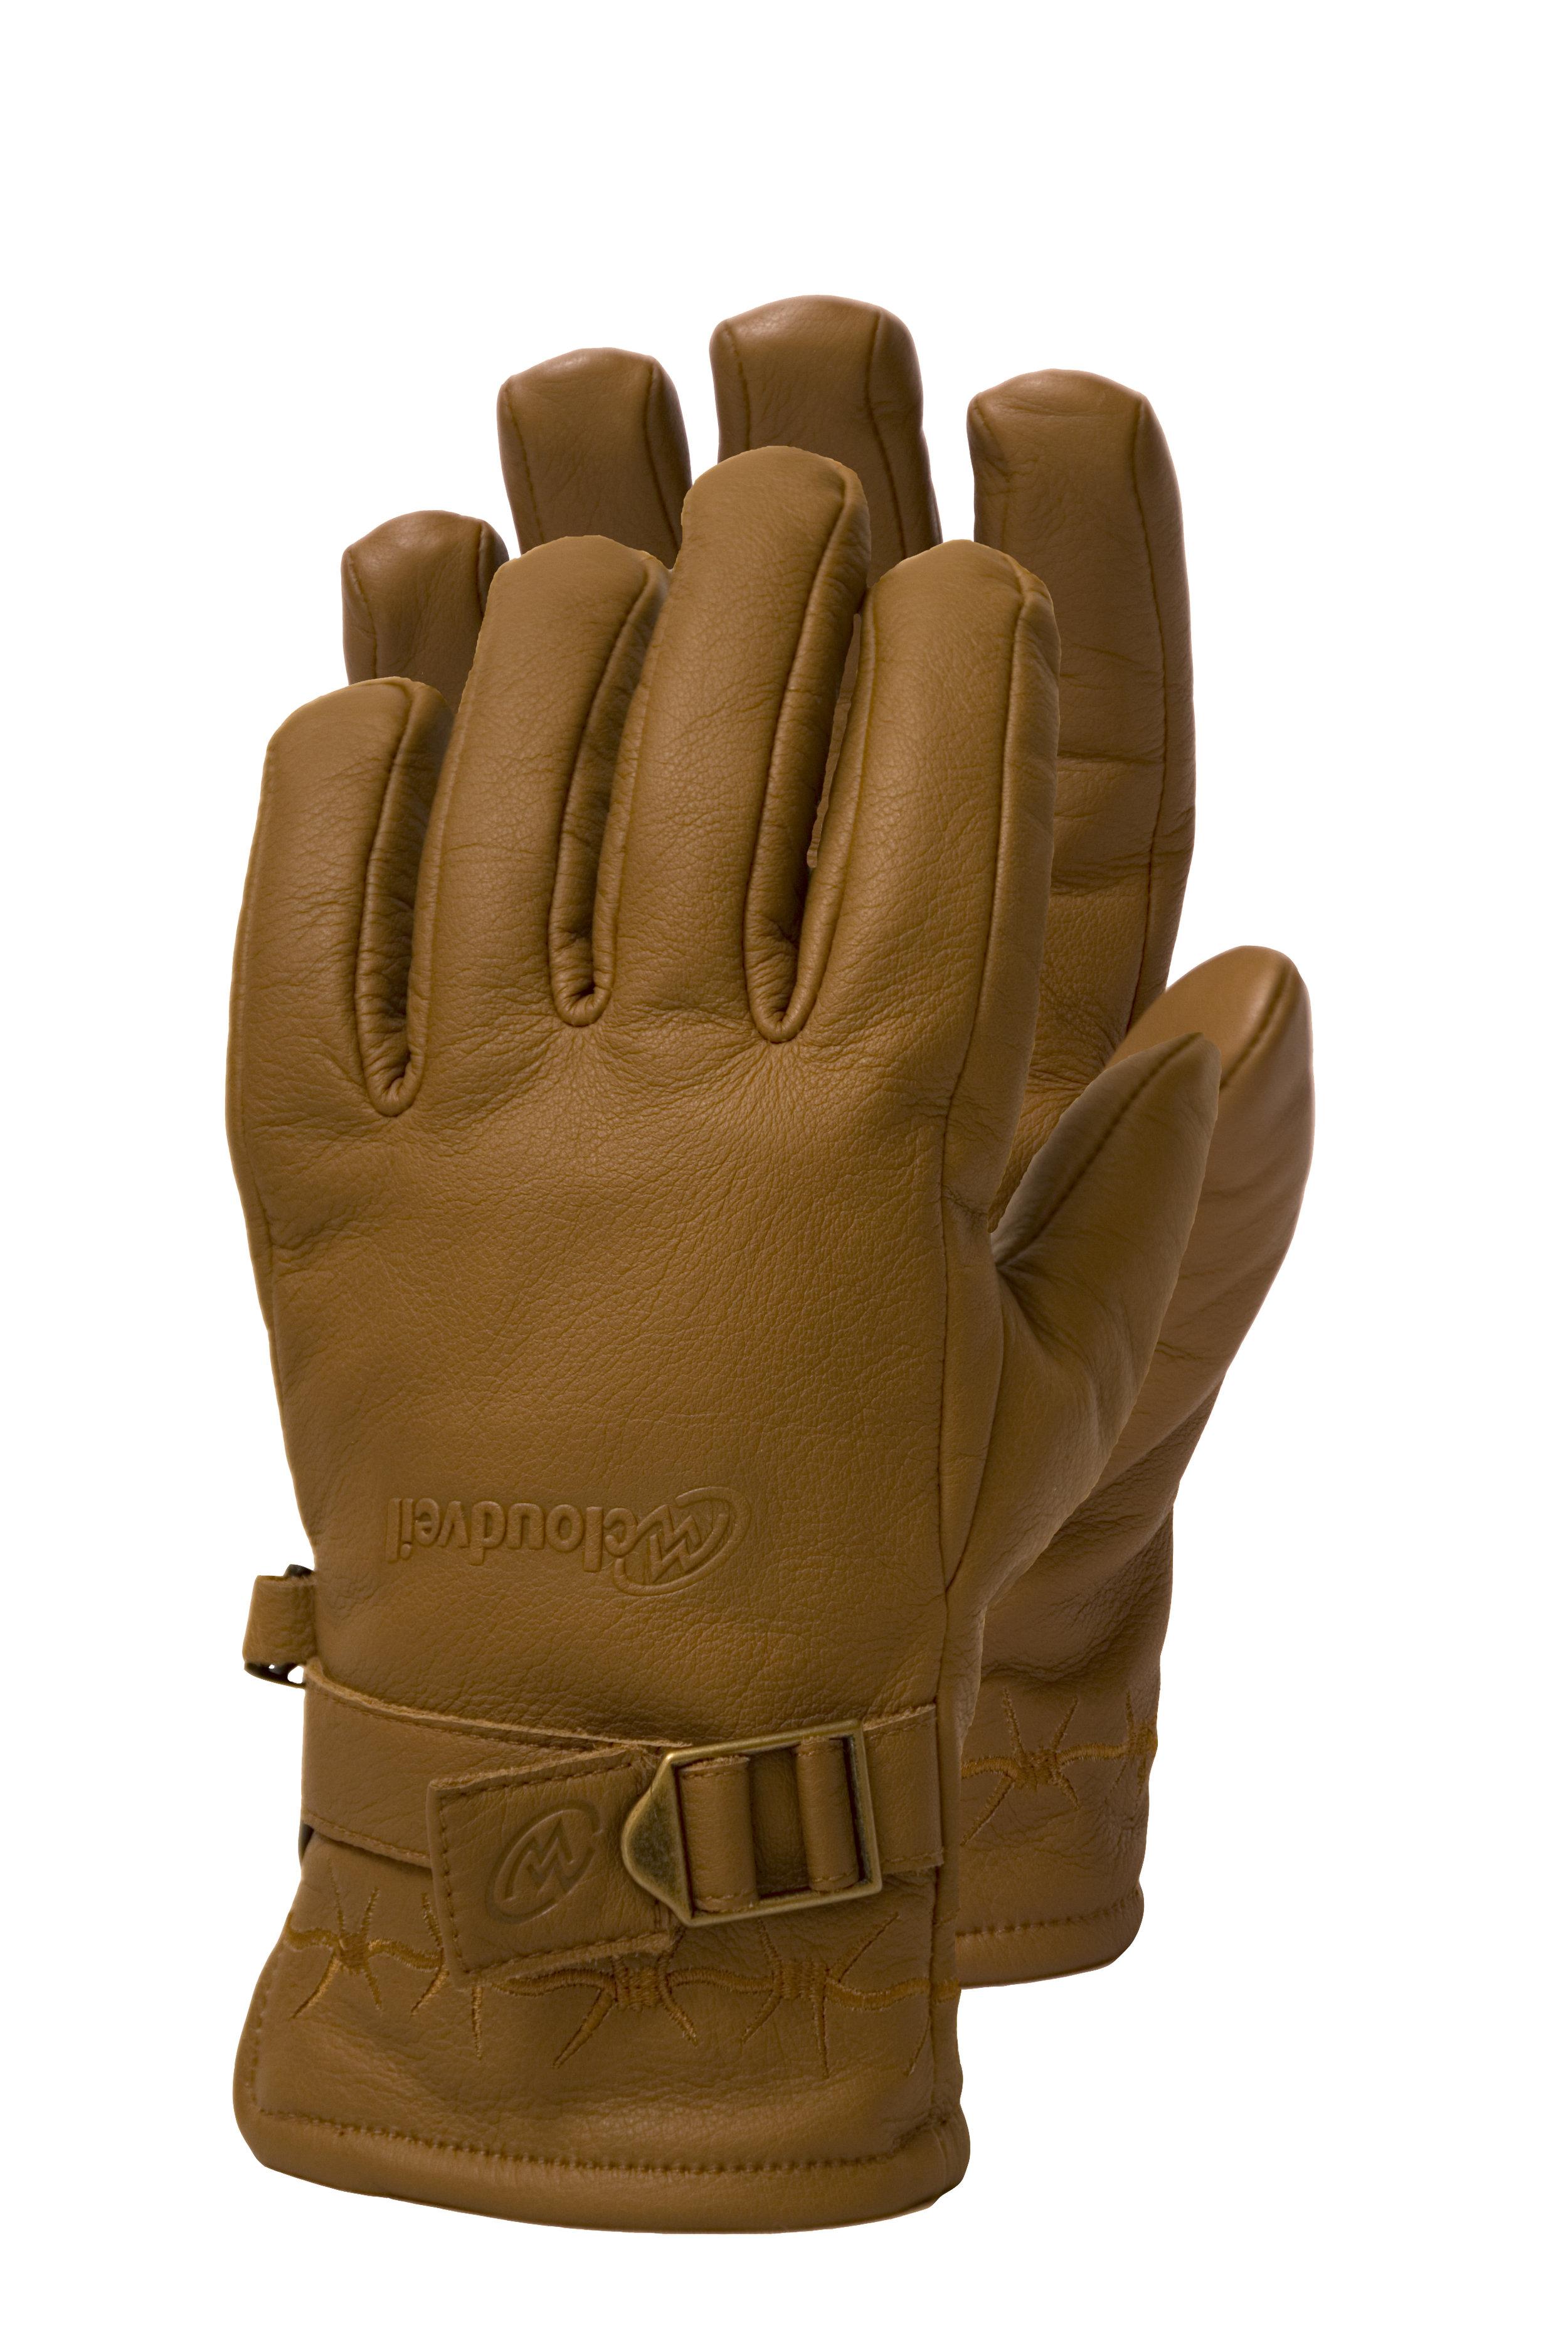 cmw gloves.jpg